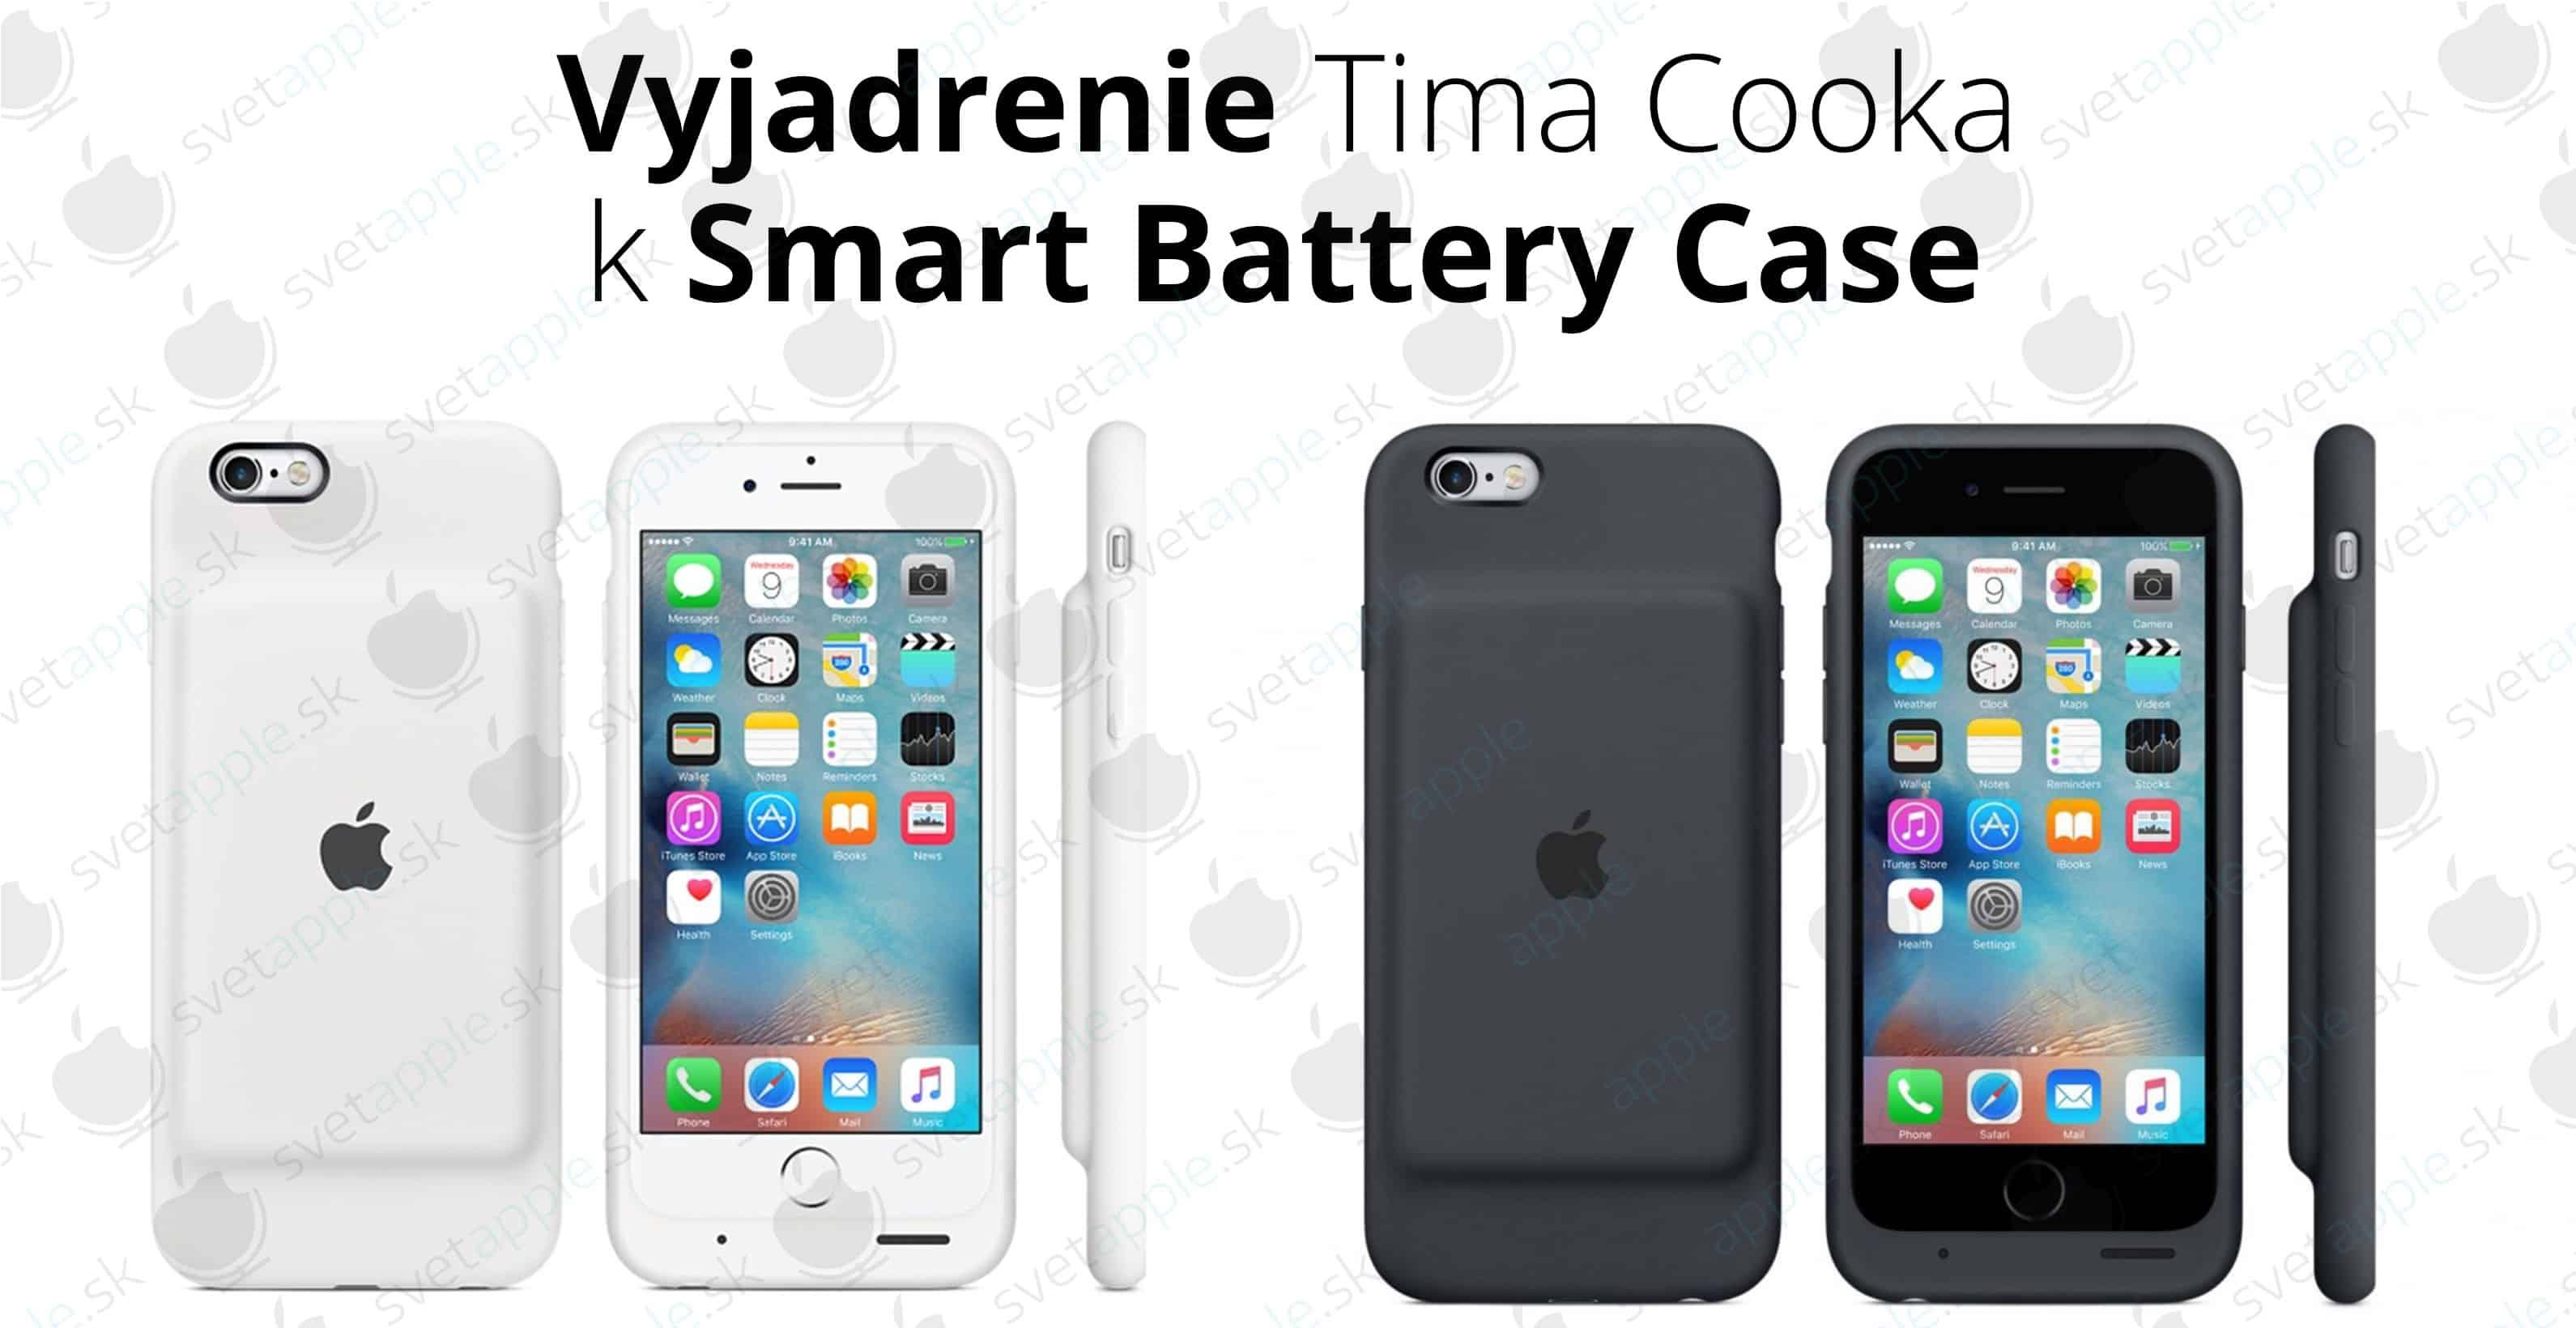 vyjadrenie-k-smart-battery-case---titulná-fotografia---SvetApple